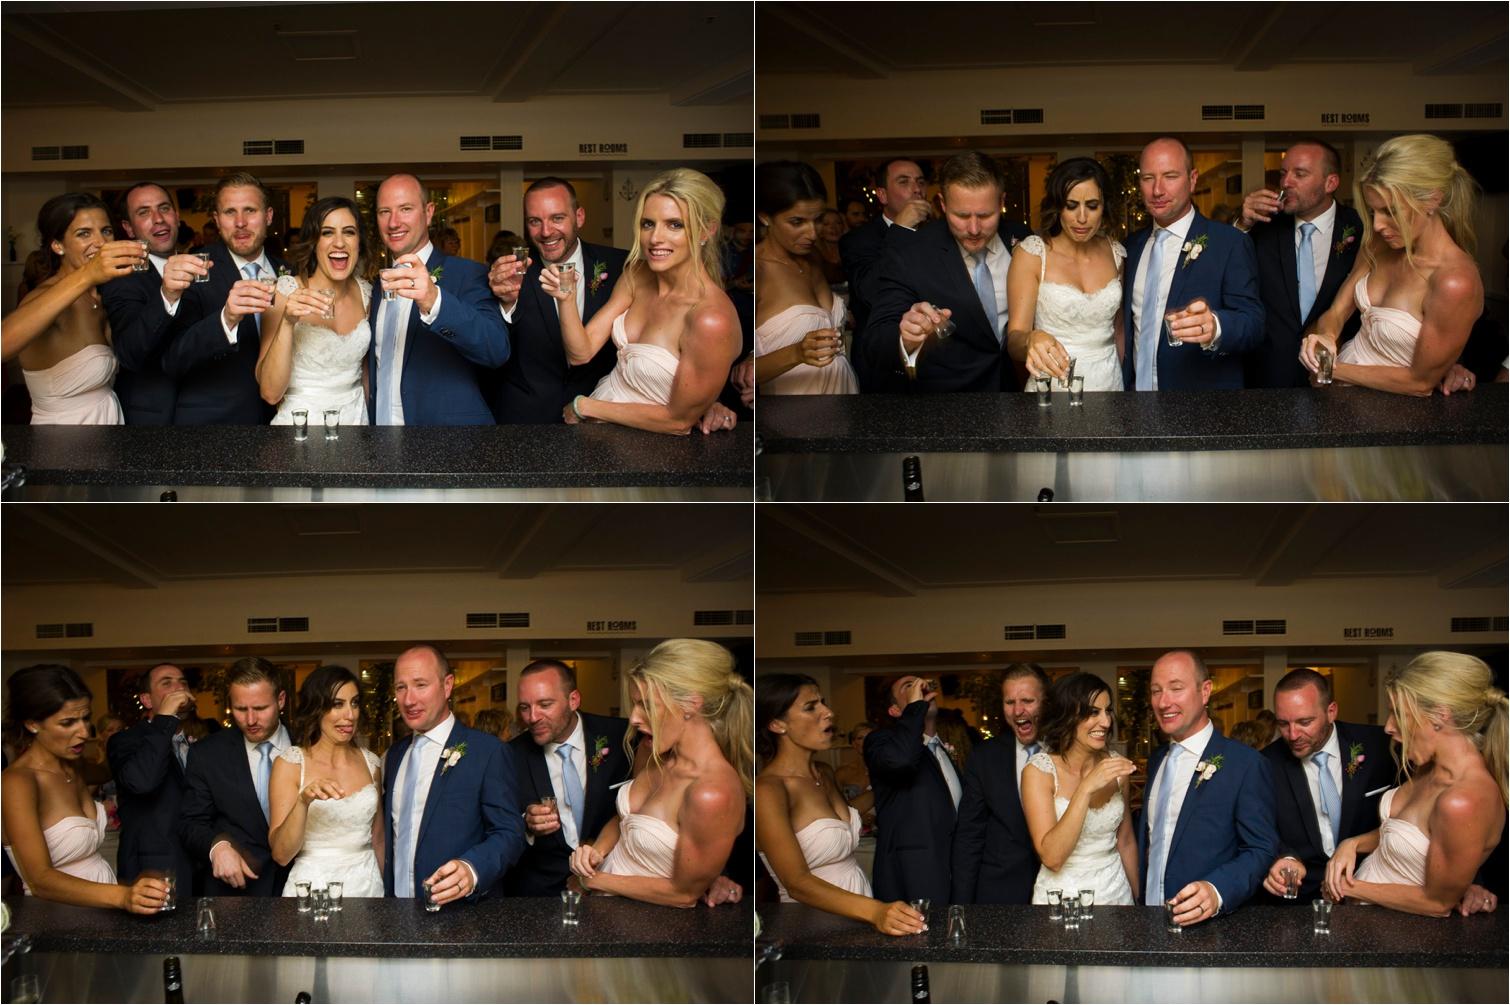 Nicole&Carlie_Watsons_Bay_Hotel_Wedding_by_Gold_Coast_Photographers-The_Follans57.jpg